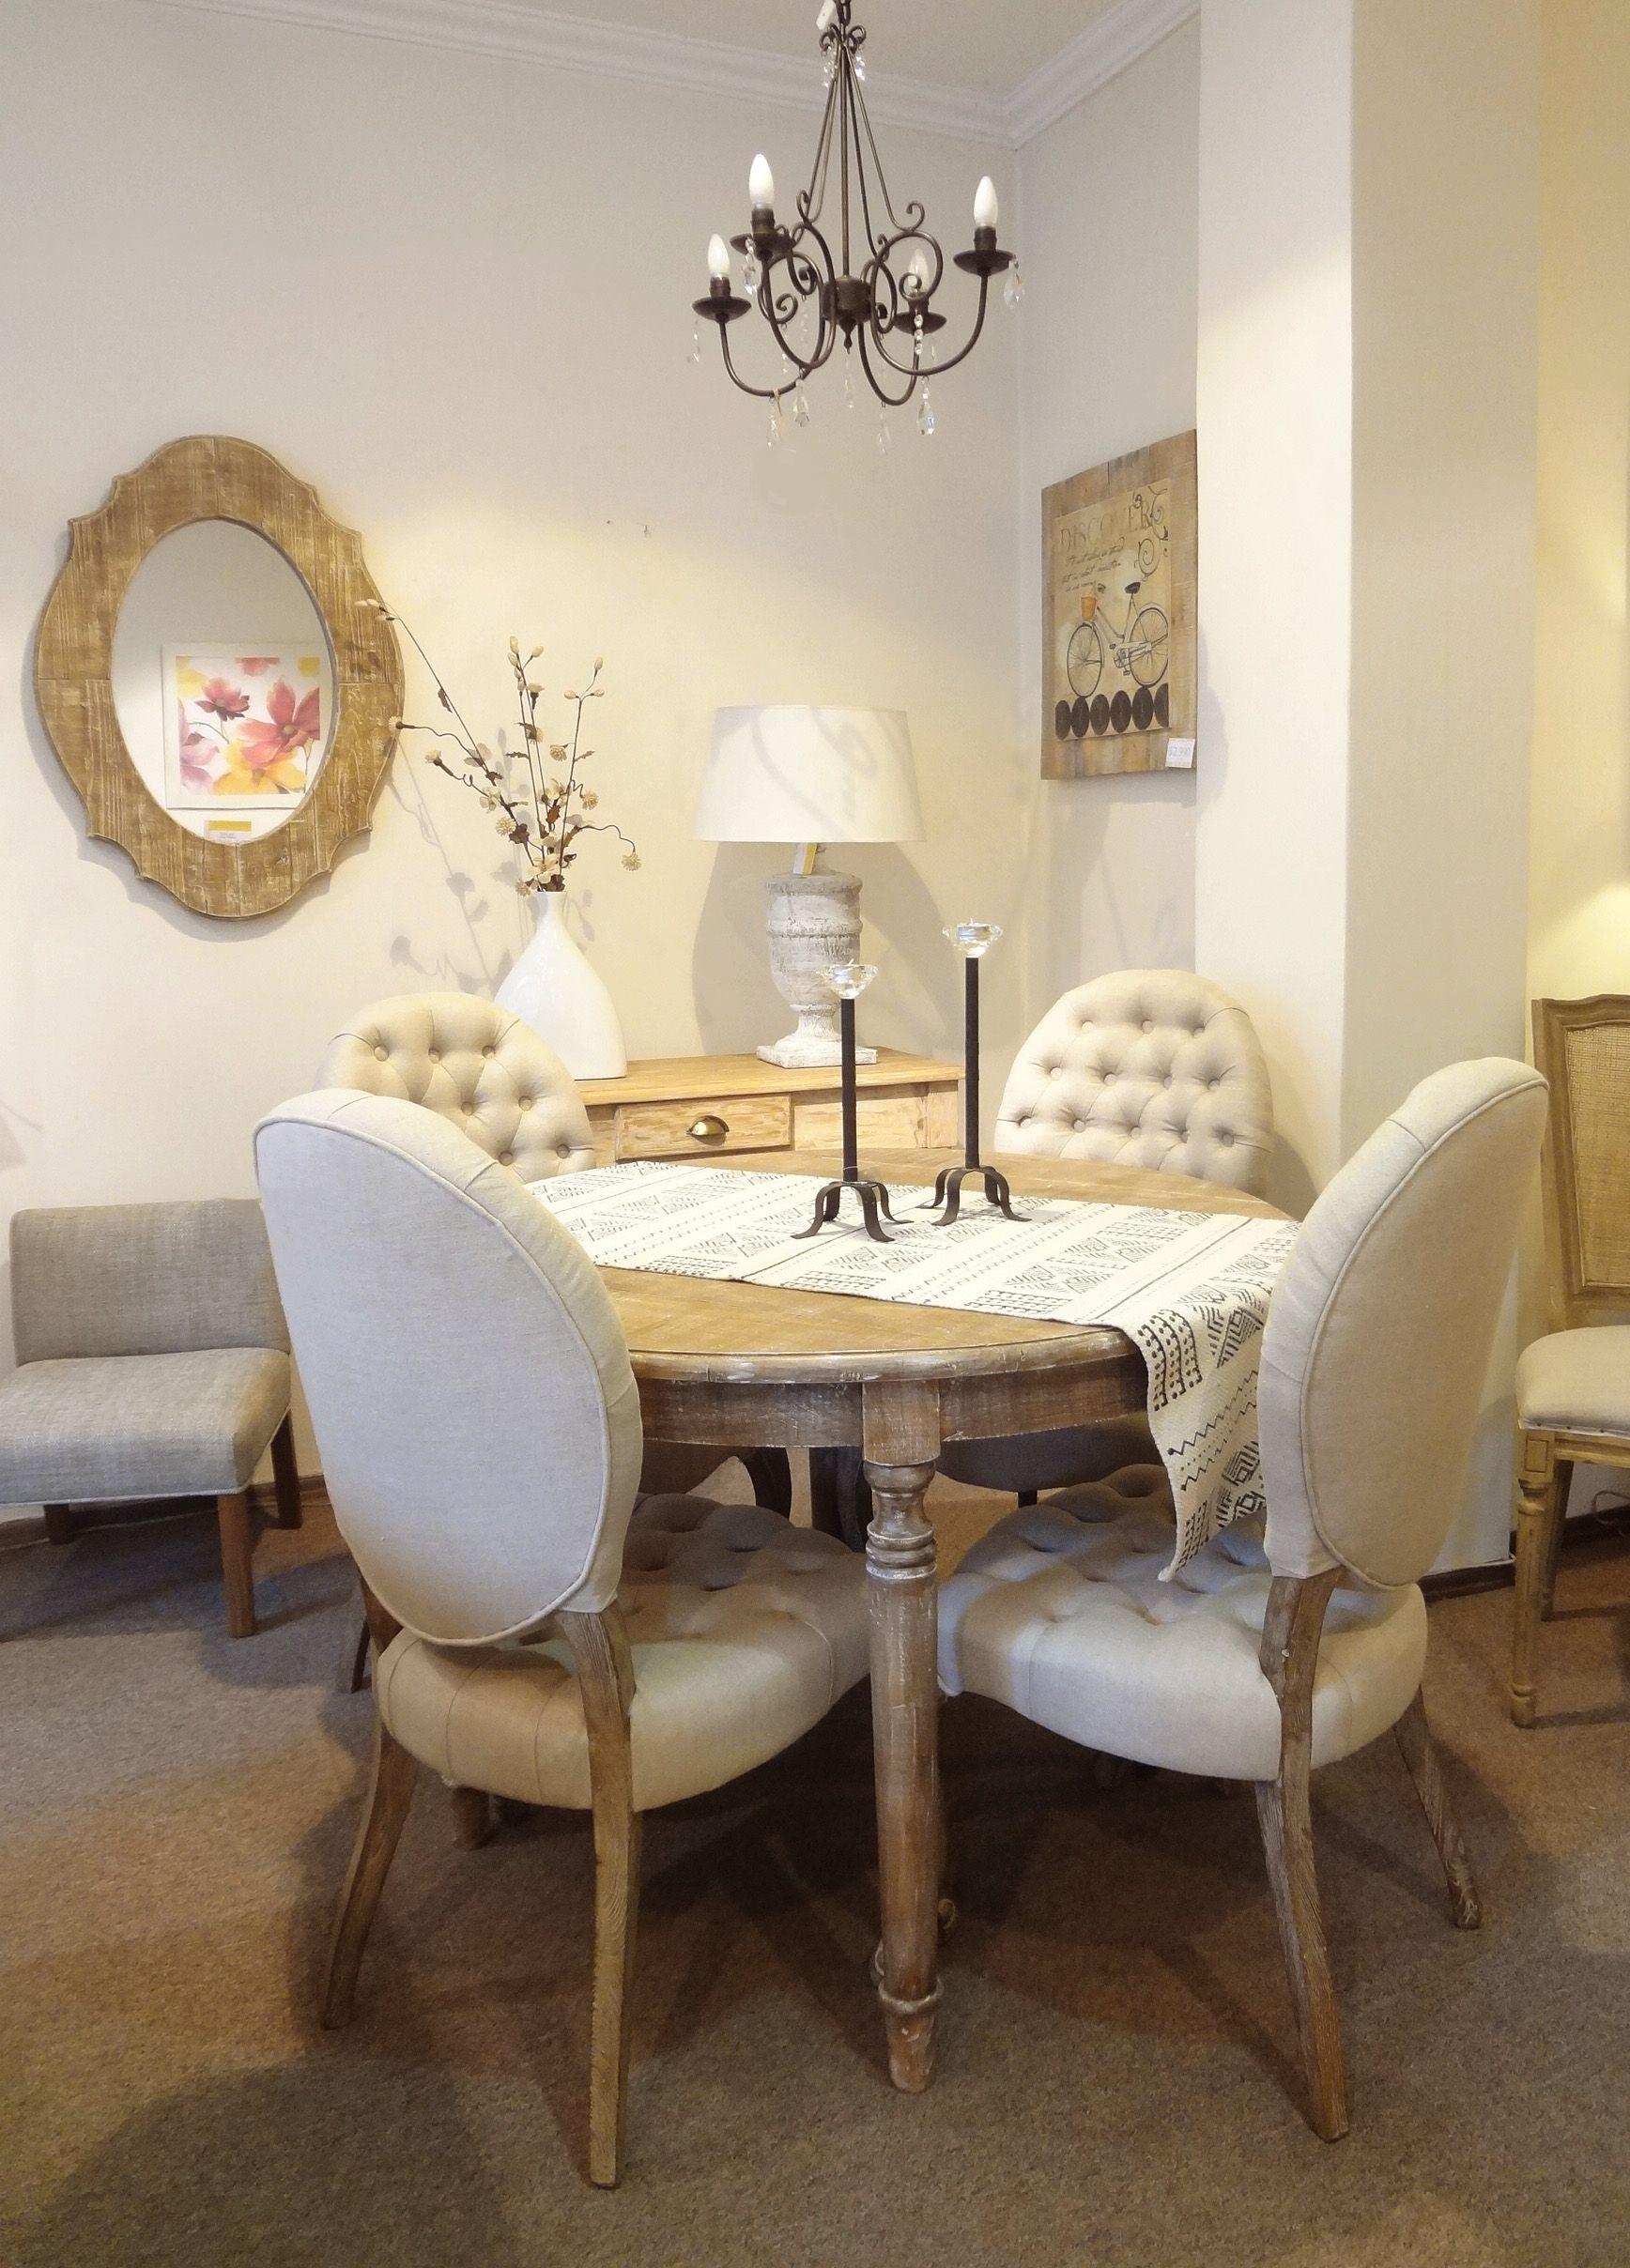 Mesa imperio de 110cm de di metro combinada con sillas de - Mesa shabby chic ...